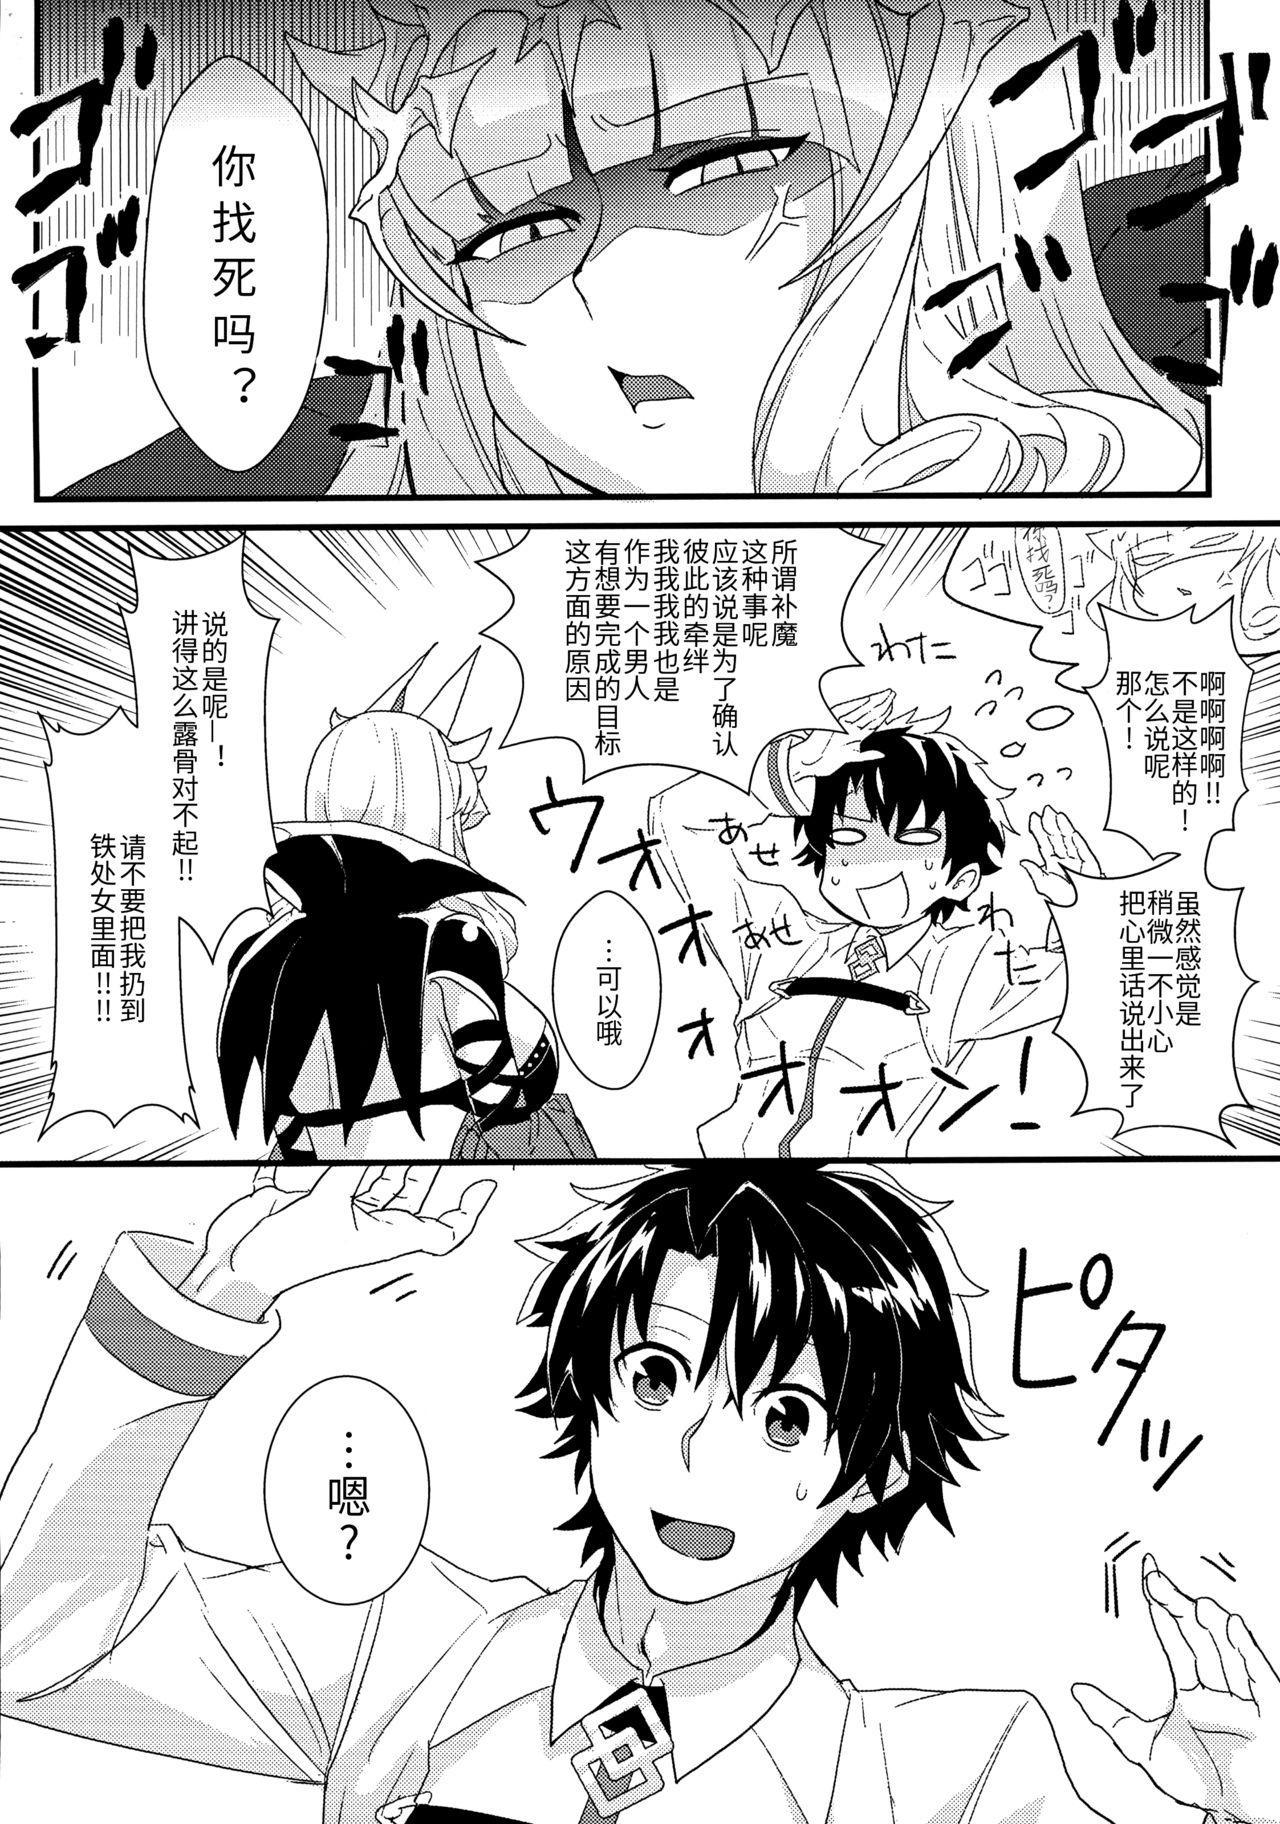 Carmilla-san to Ichaicha Shitai! 5